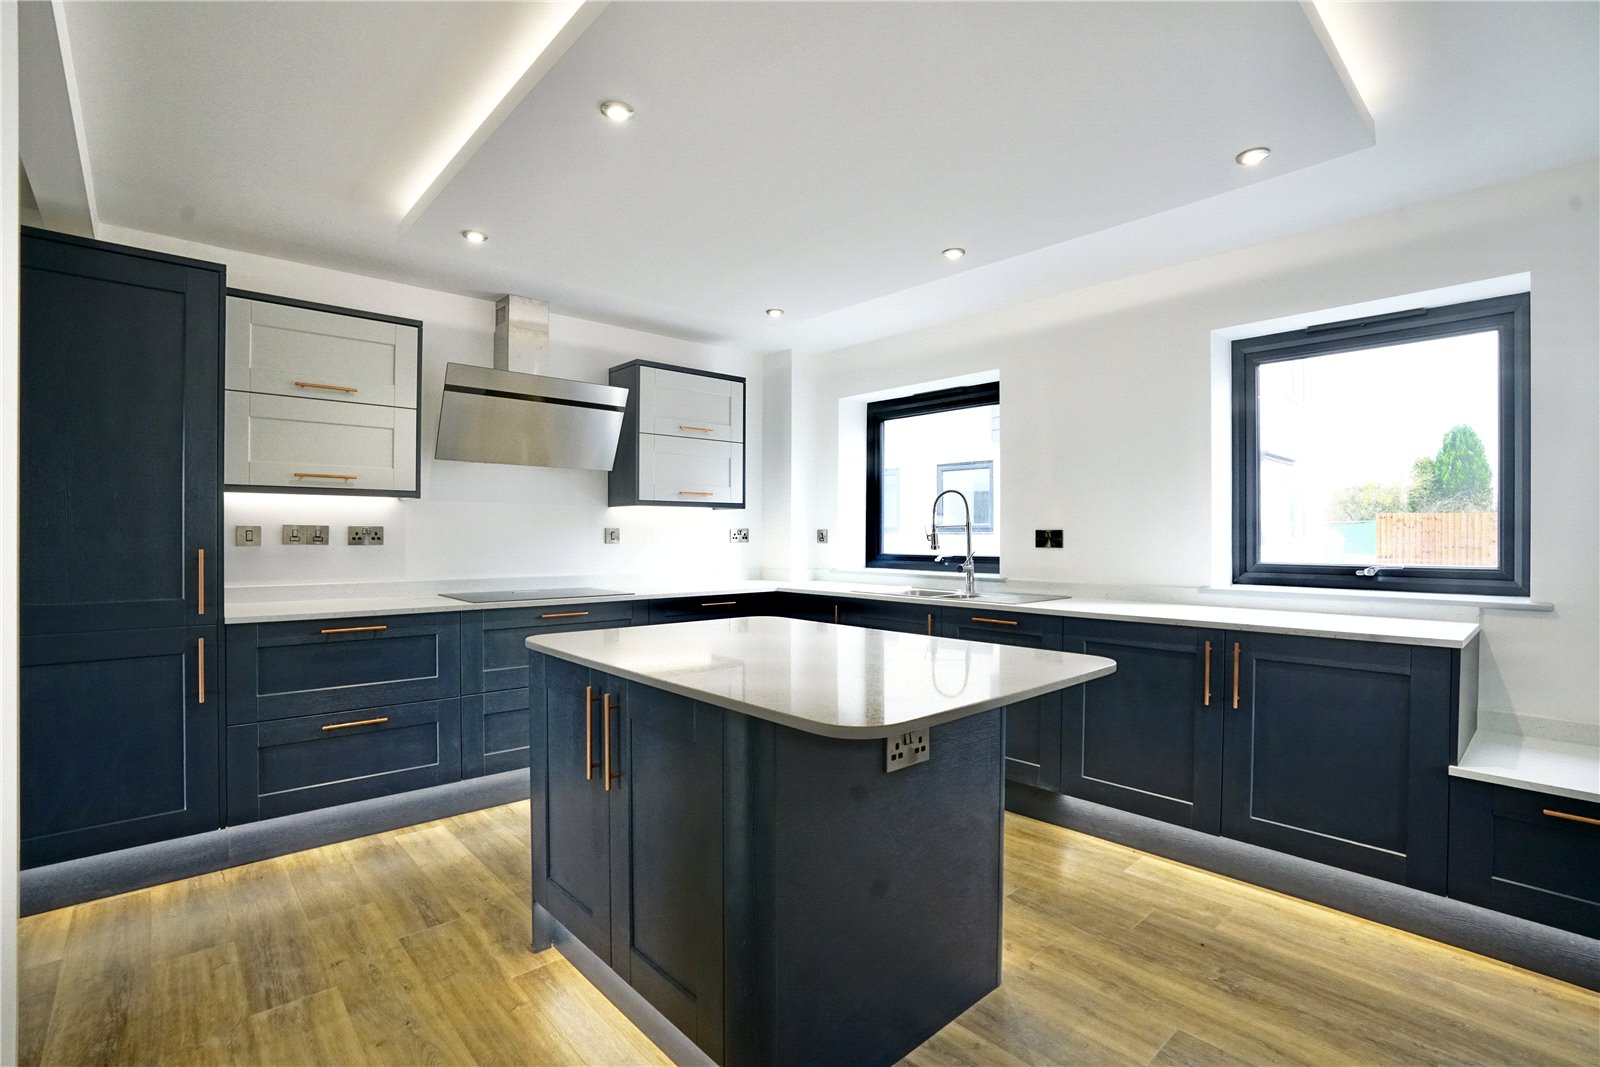 5 bed house for sale in Eynesbury Hardwicke, PE19 6XG 0